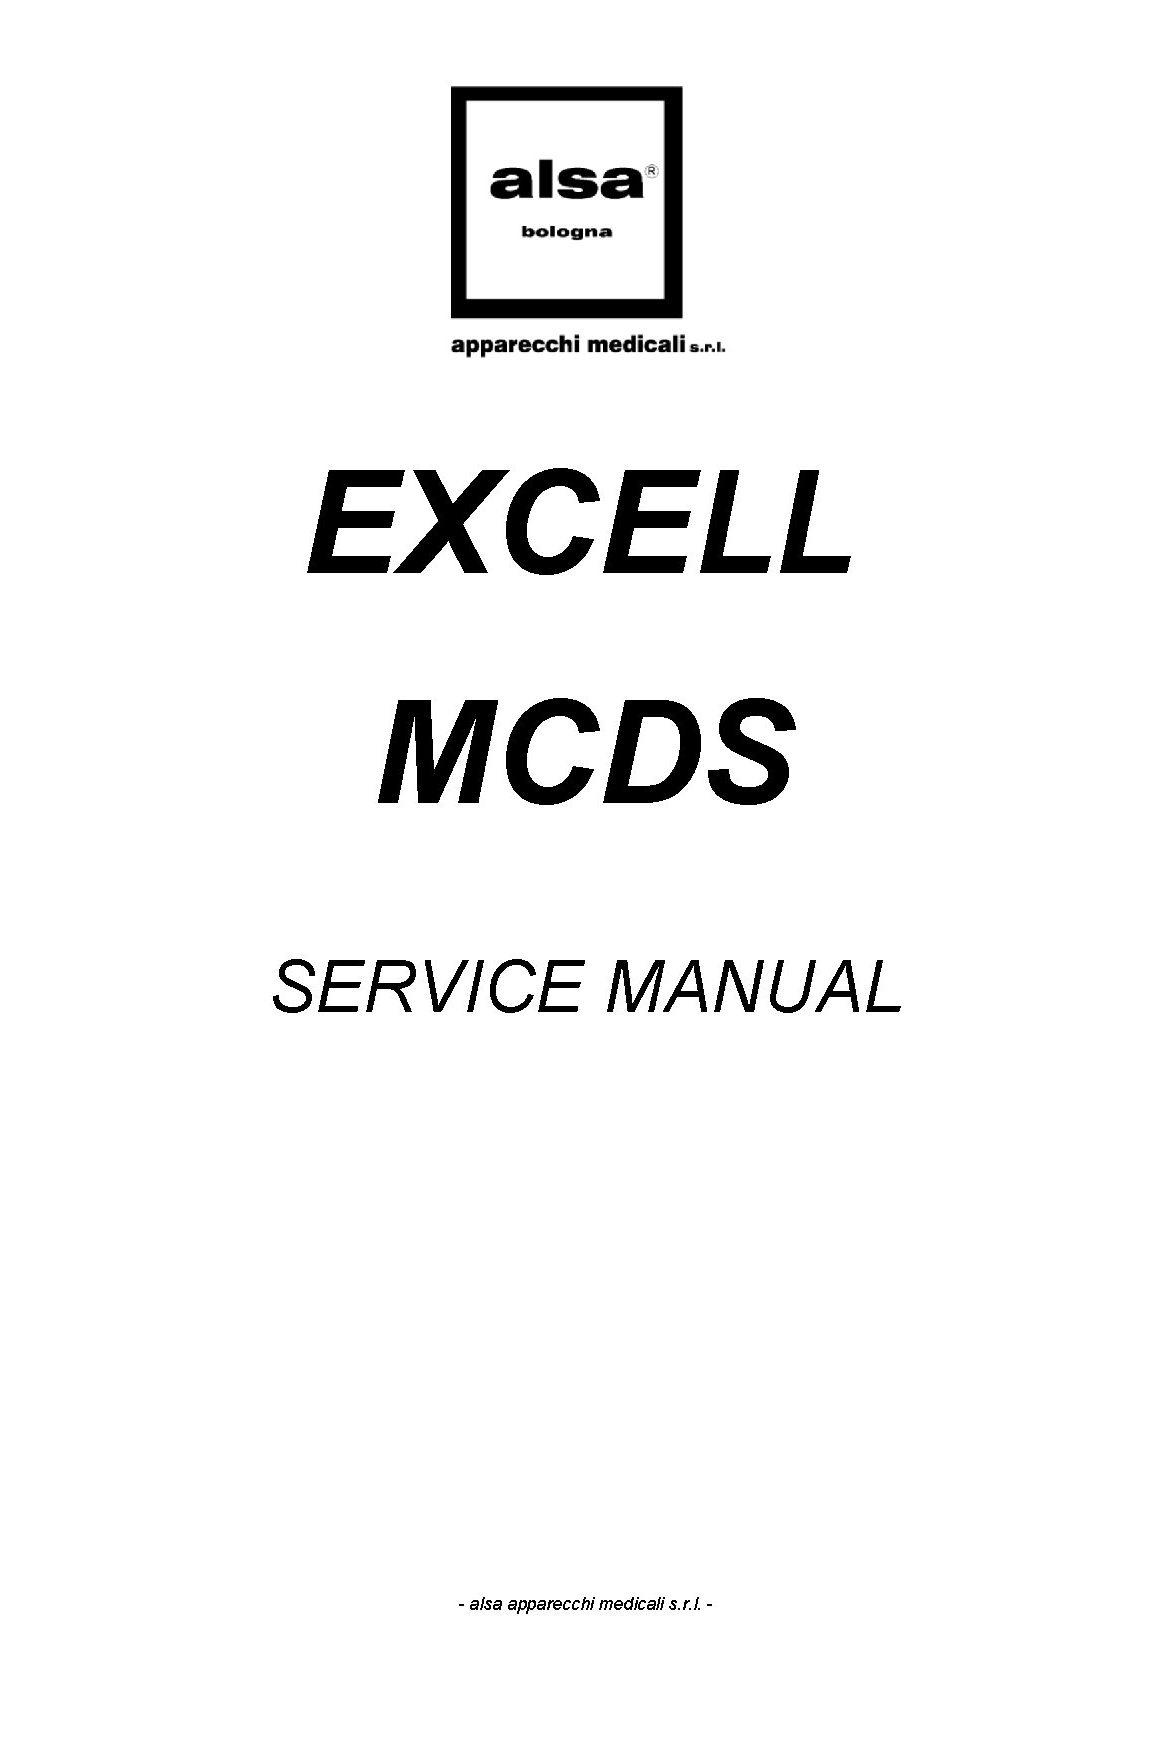 Alsa Alsatom Excell MCDS Service manual